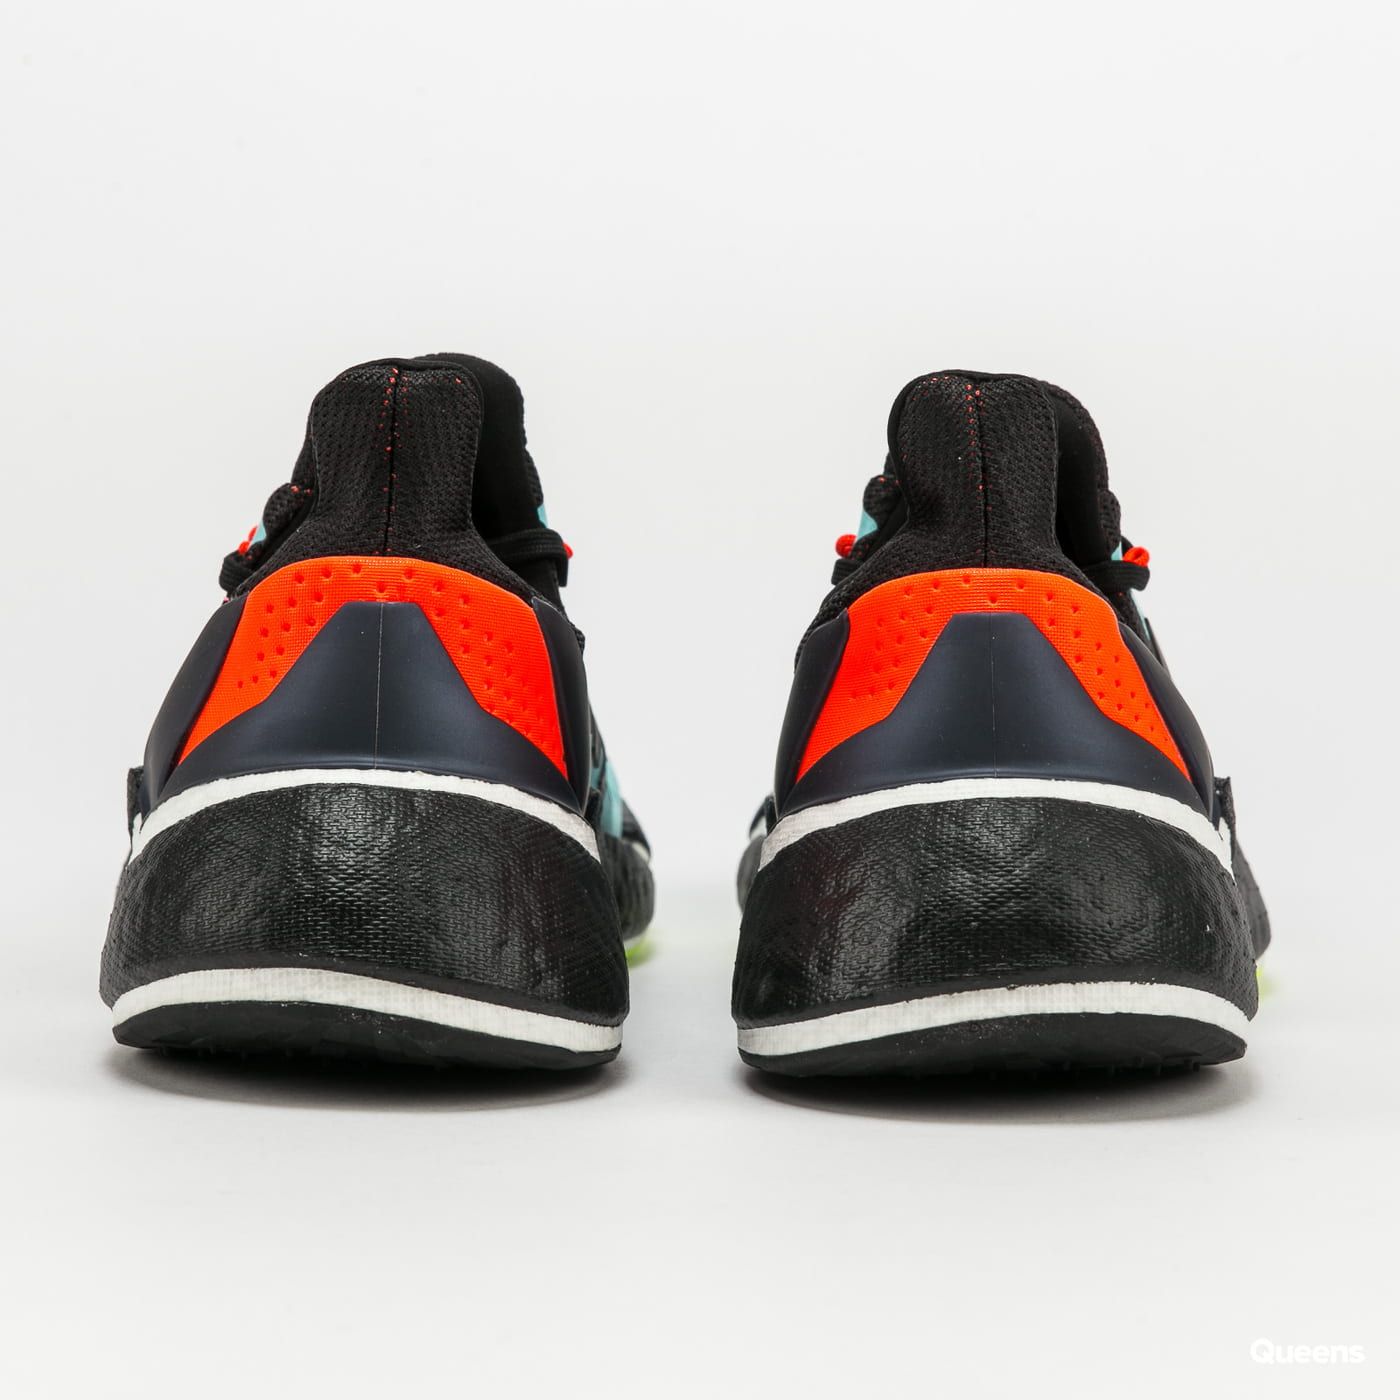 adidas Performance X9000L4 M cblack / cblack / solred